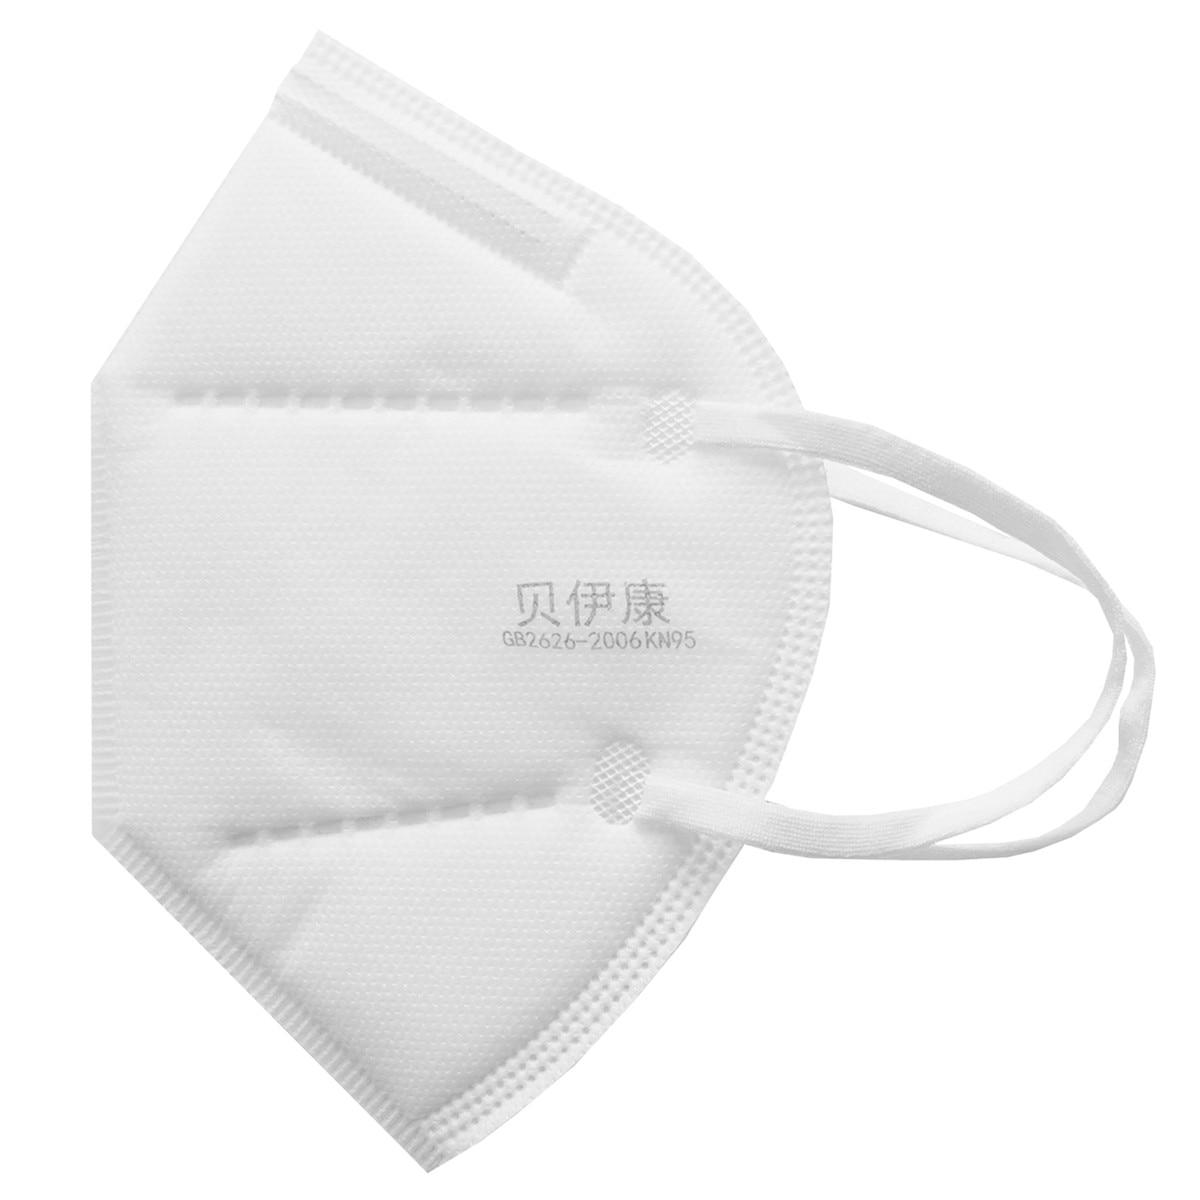 10pcs mask N95 anti virus Professional Mask Pre sale  Disposable Elastic Mouth Soft Breathable  CE Face Mask N95 anticorona mask 3